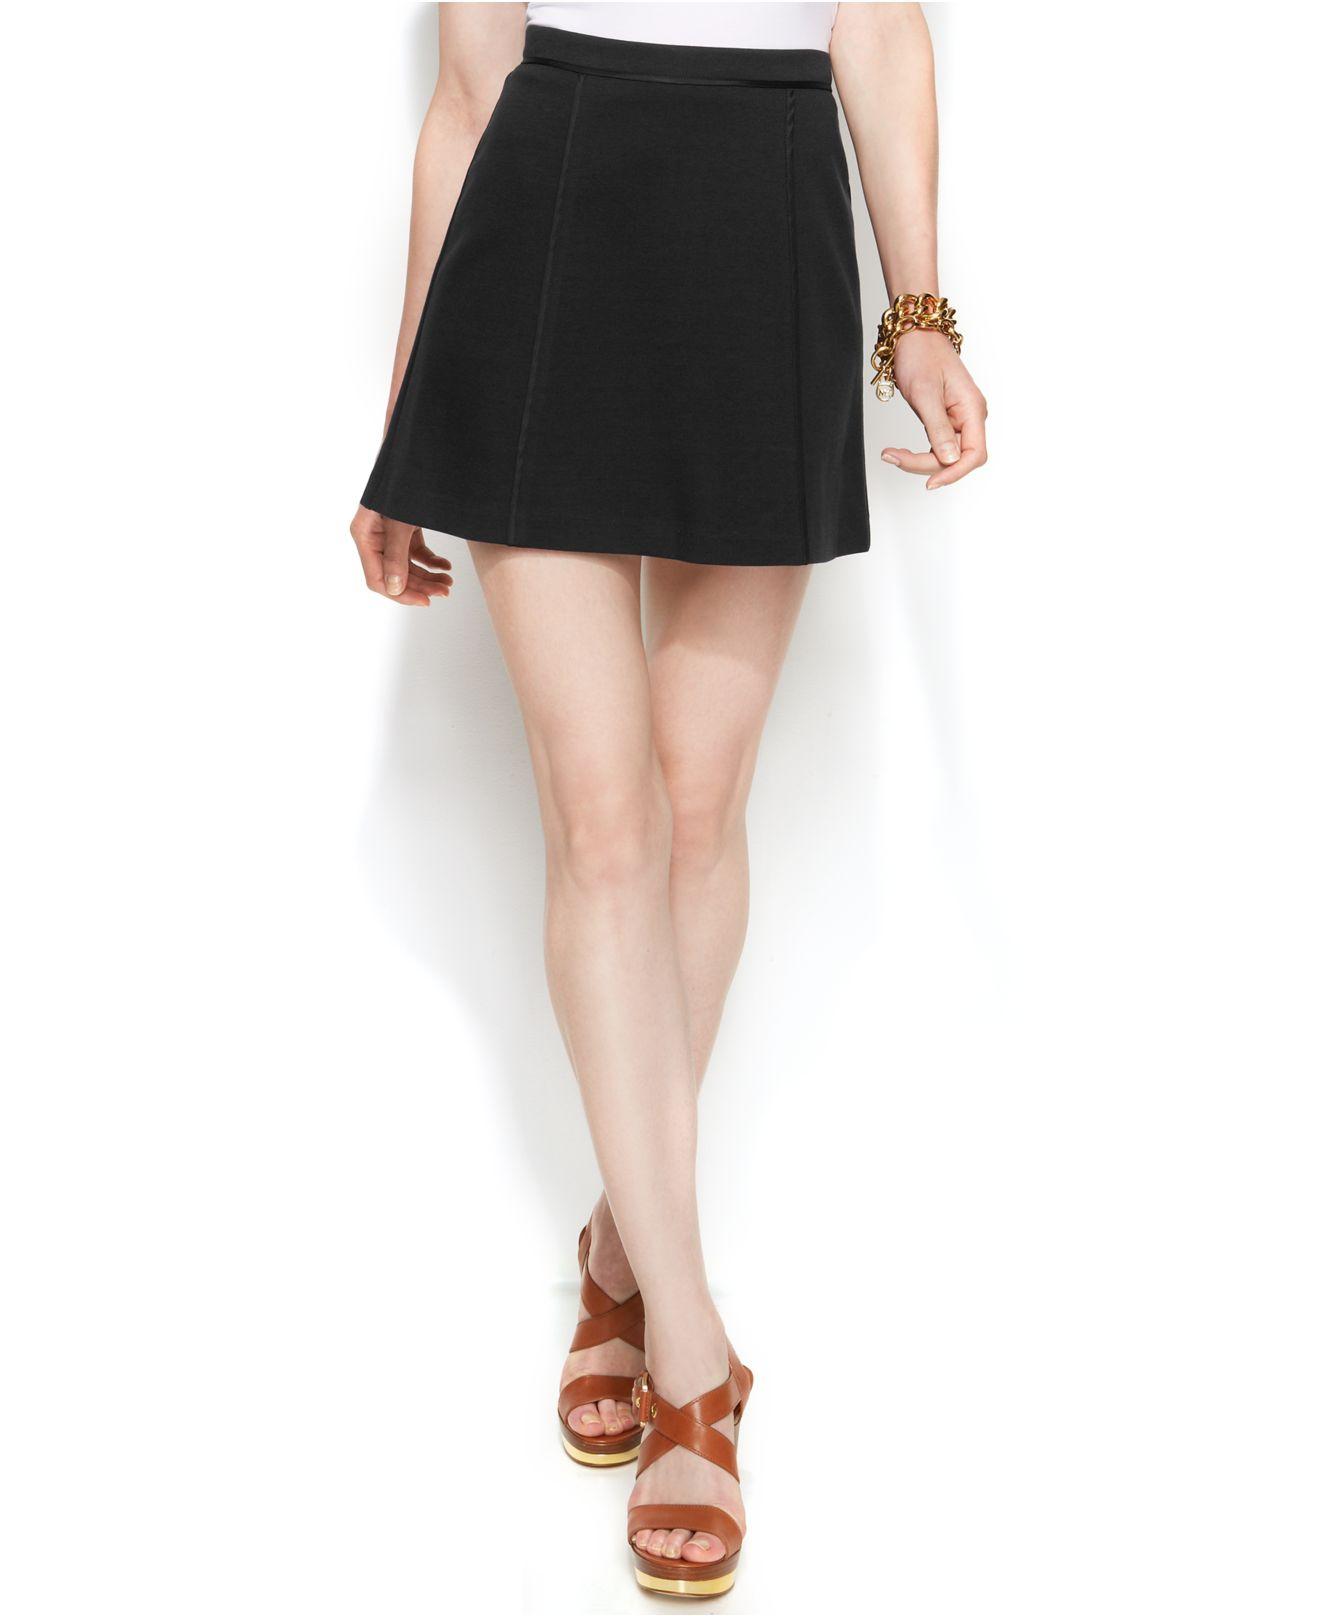 Michael kors Michael Petite Seamed A-Line Mini Skirt in Black | Lyst